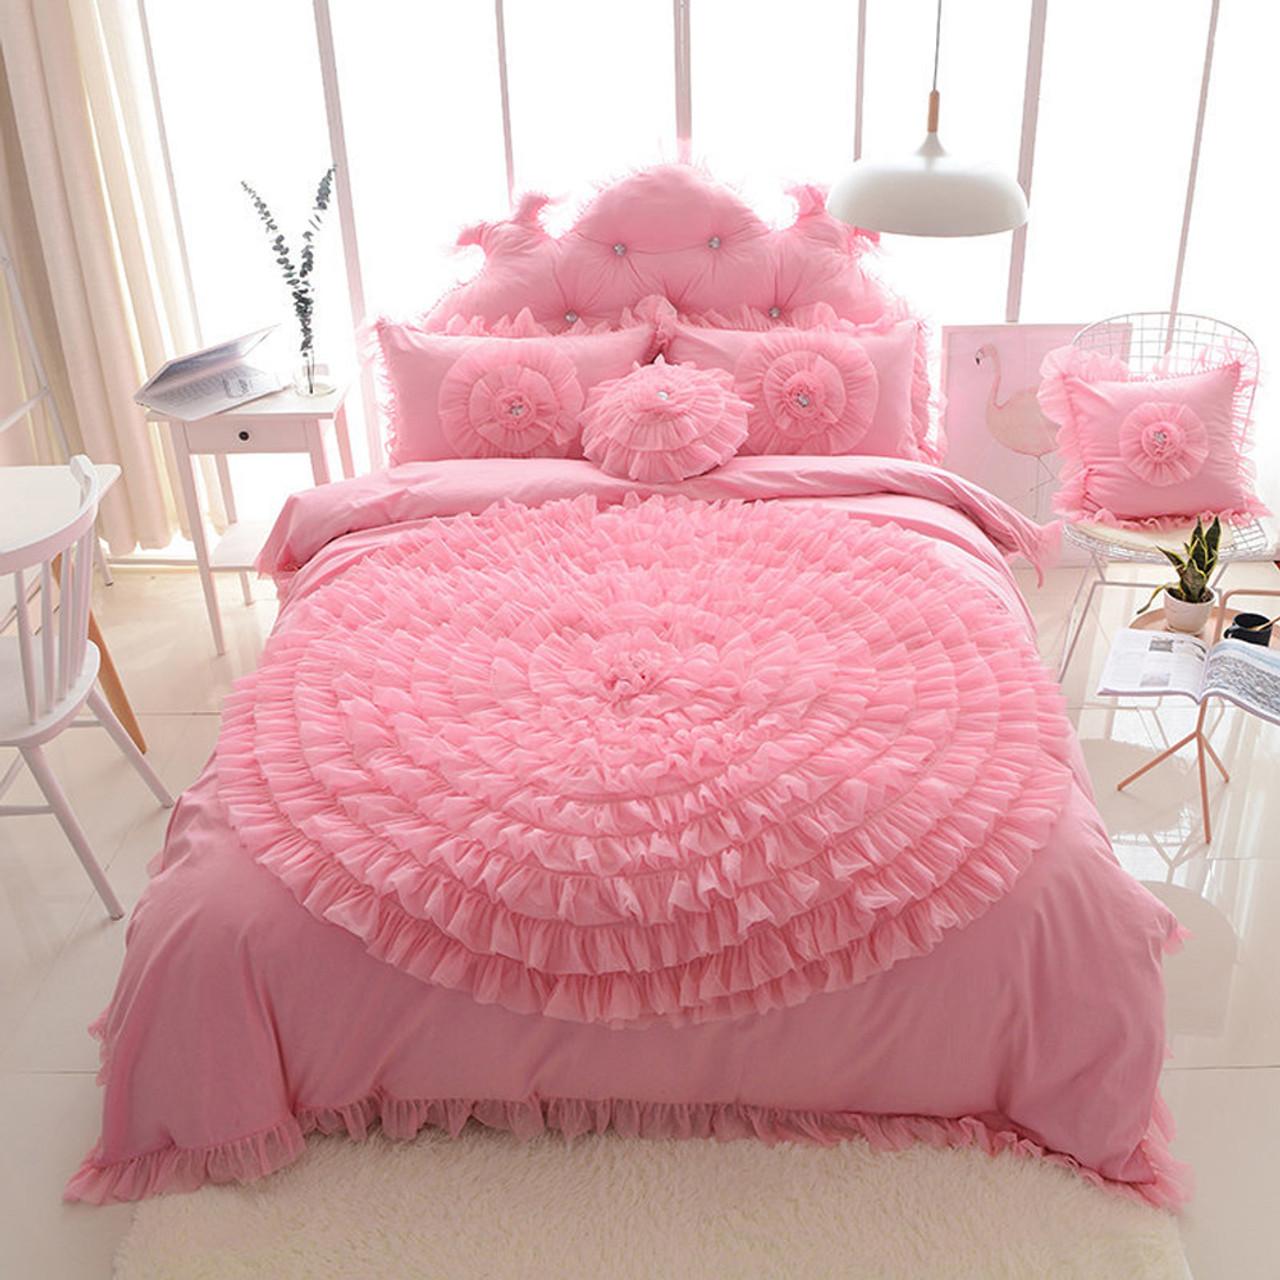 Korean Princess Style Lace Flower Fold Lace Design Duvet Cover Bed Sheet Set 100 Cotton Pink White Blue Red Purple Bedding Set Onshopdeals Com